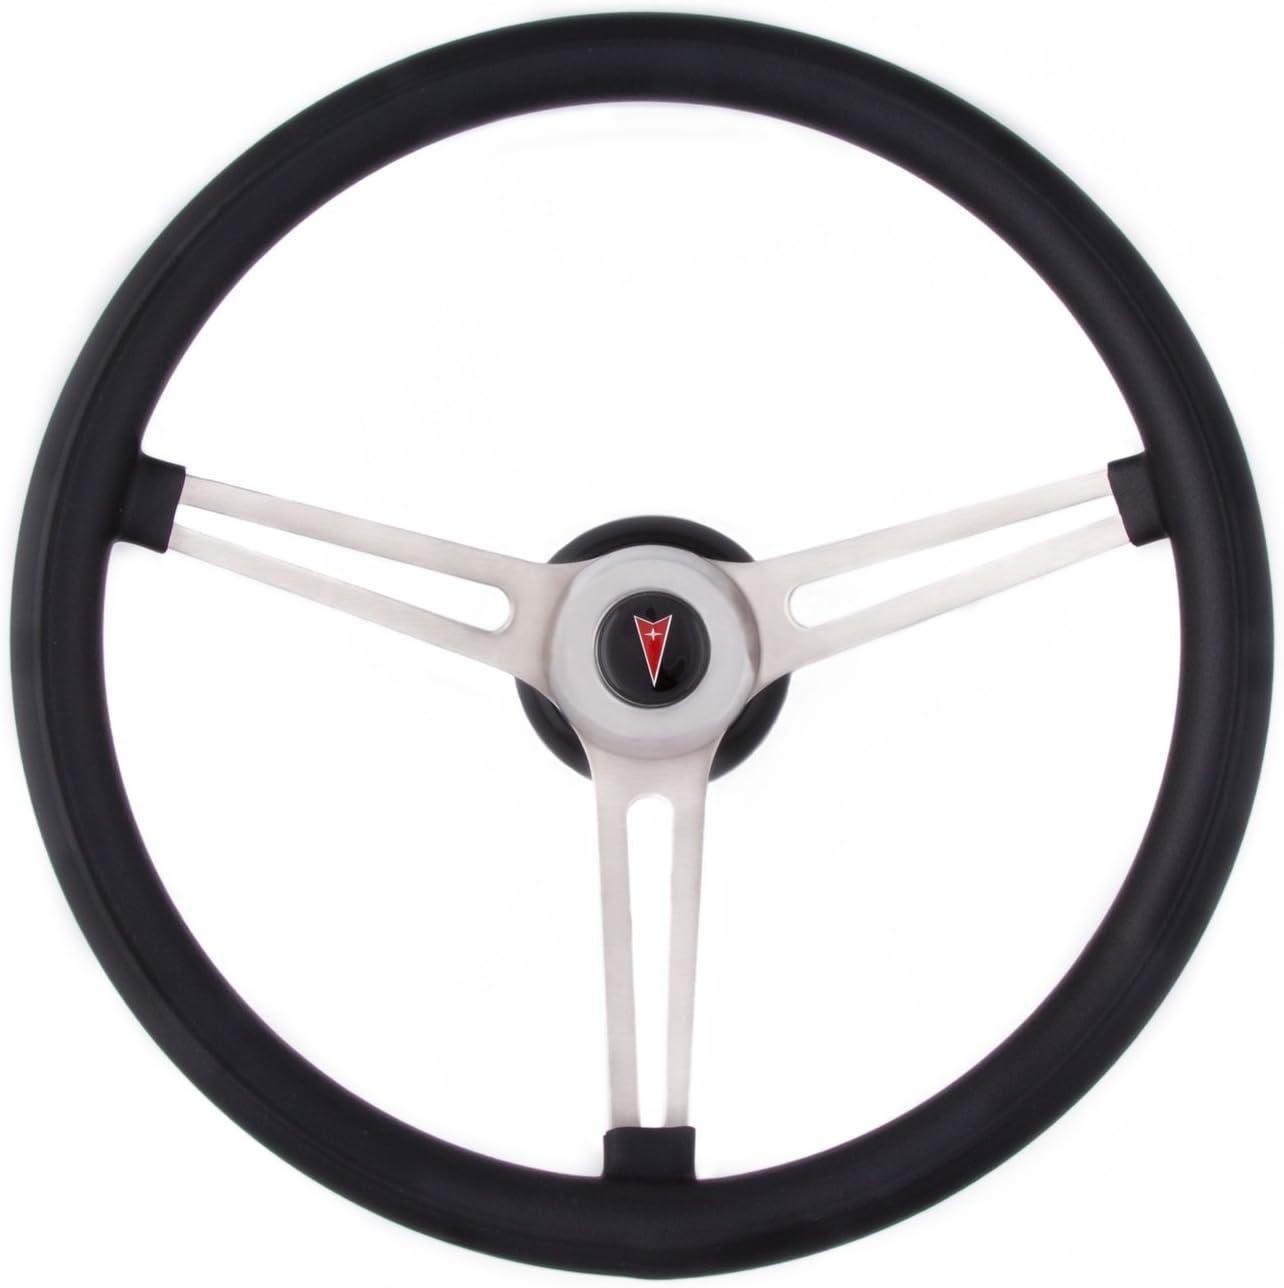 B000CMD9OA Grant 989 Classic Pontiac Wheel 61Tsj8EDgbL.SL1500_